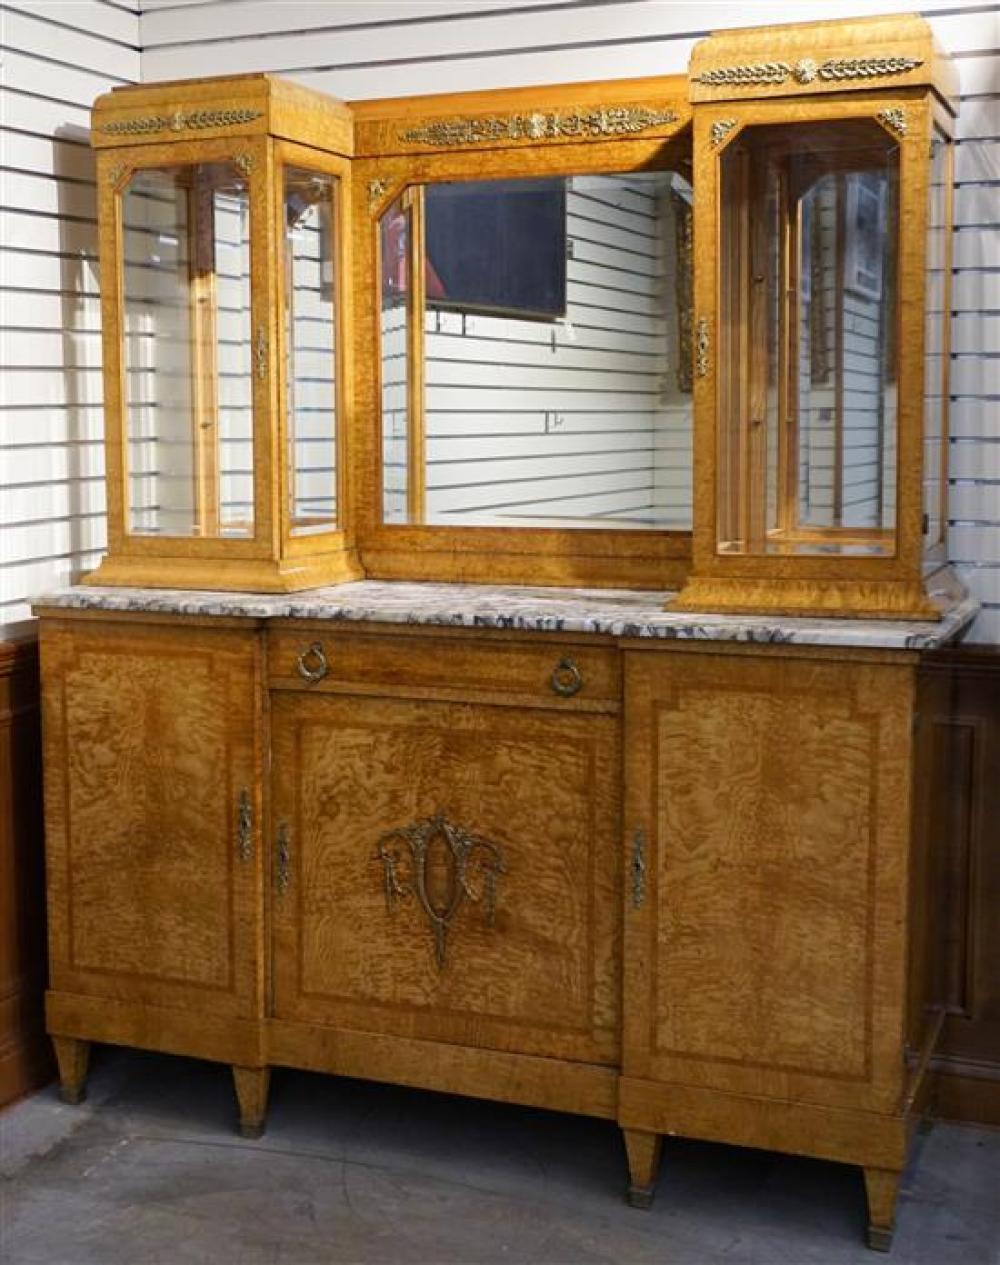 Louis XVI Style Gilt Metal Mounted Pollard Oak and Mirrored Back Sideboard Height: 79 in, Width: 67 in, Depth: 22-1/2 in